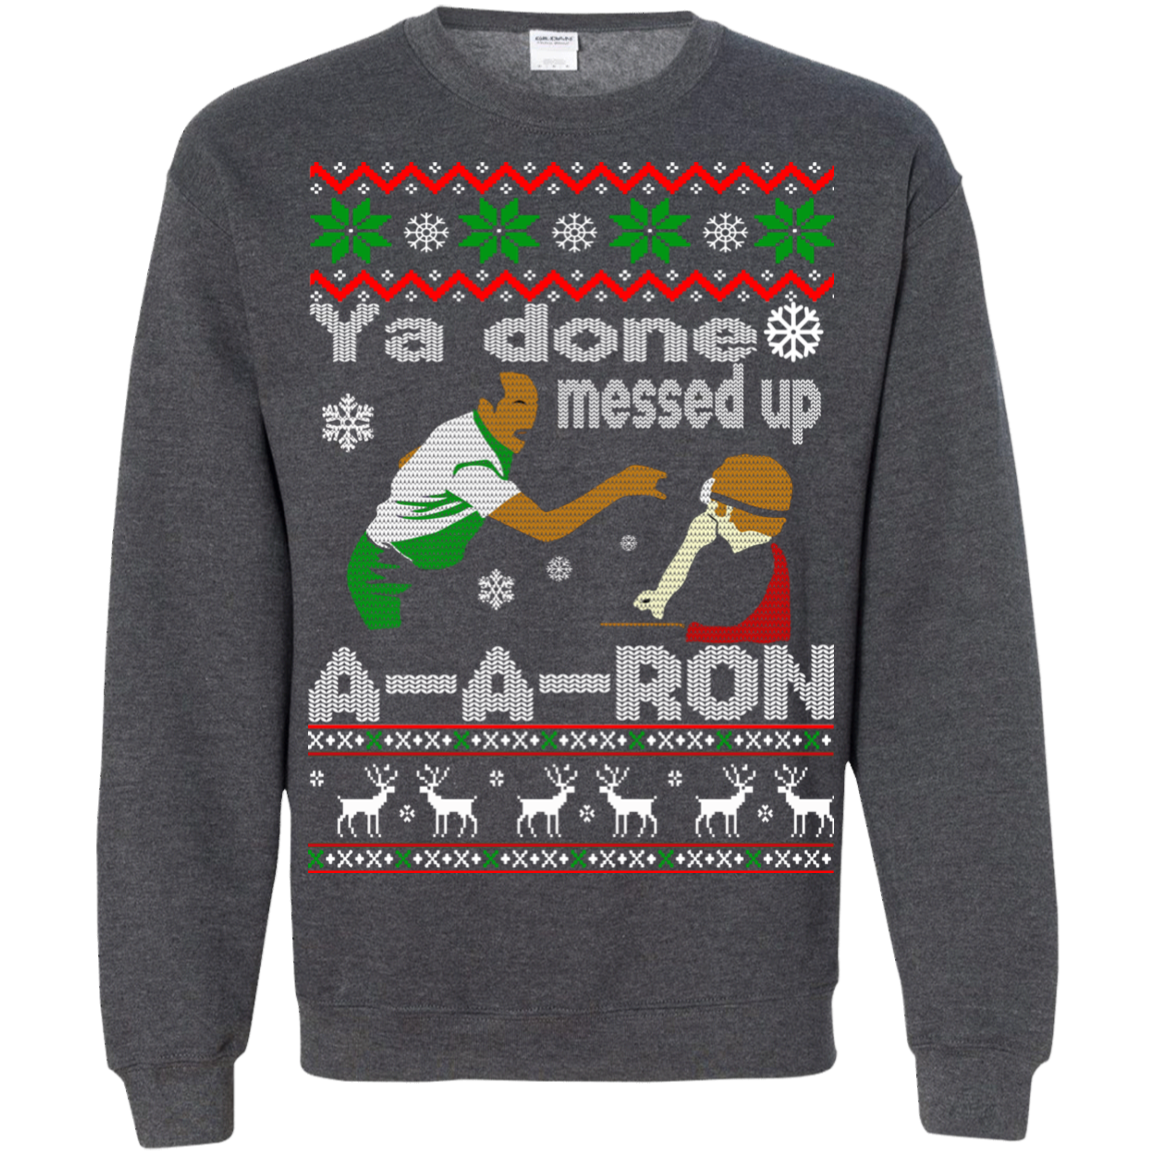 Screwed up essay sweater